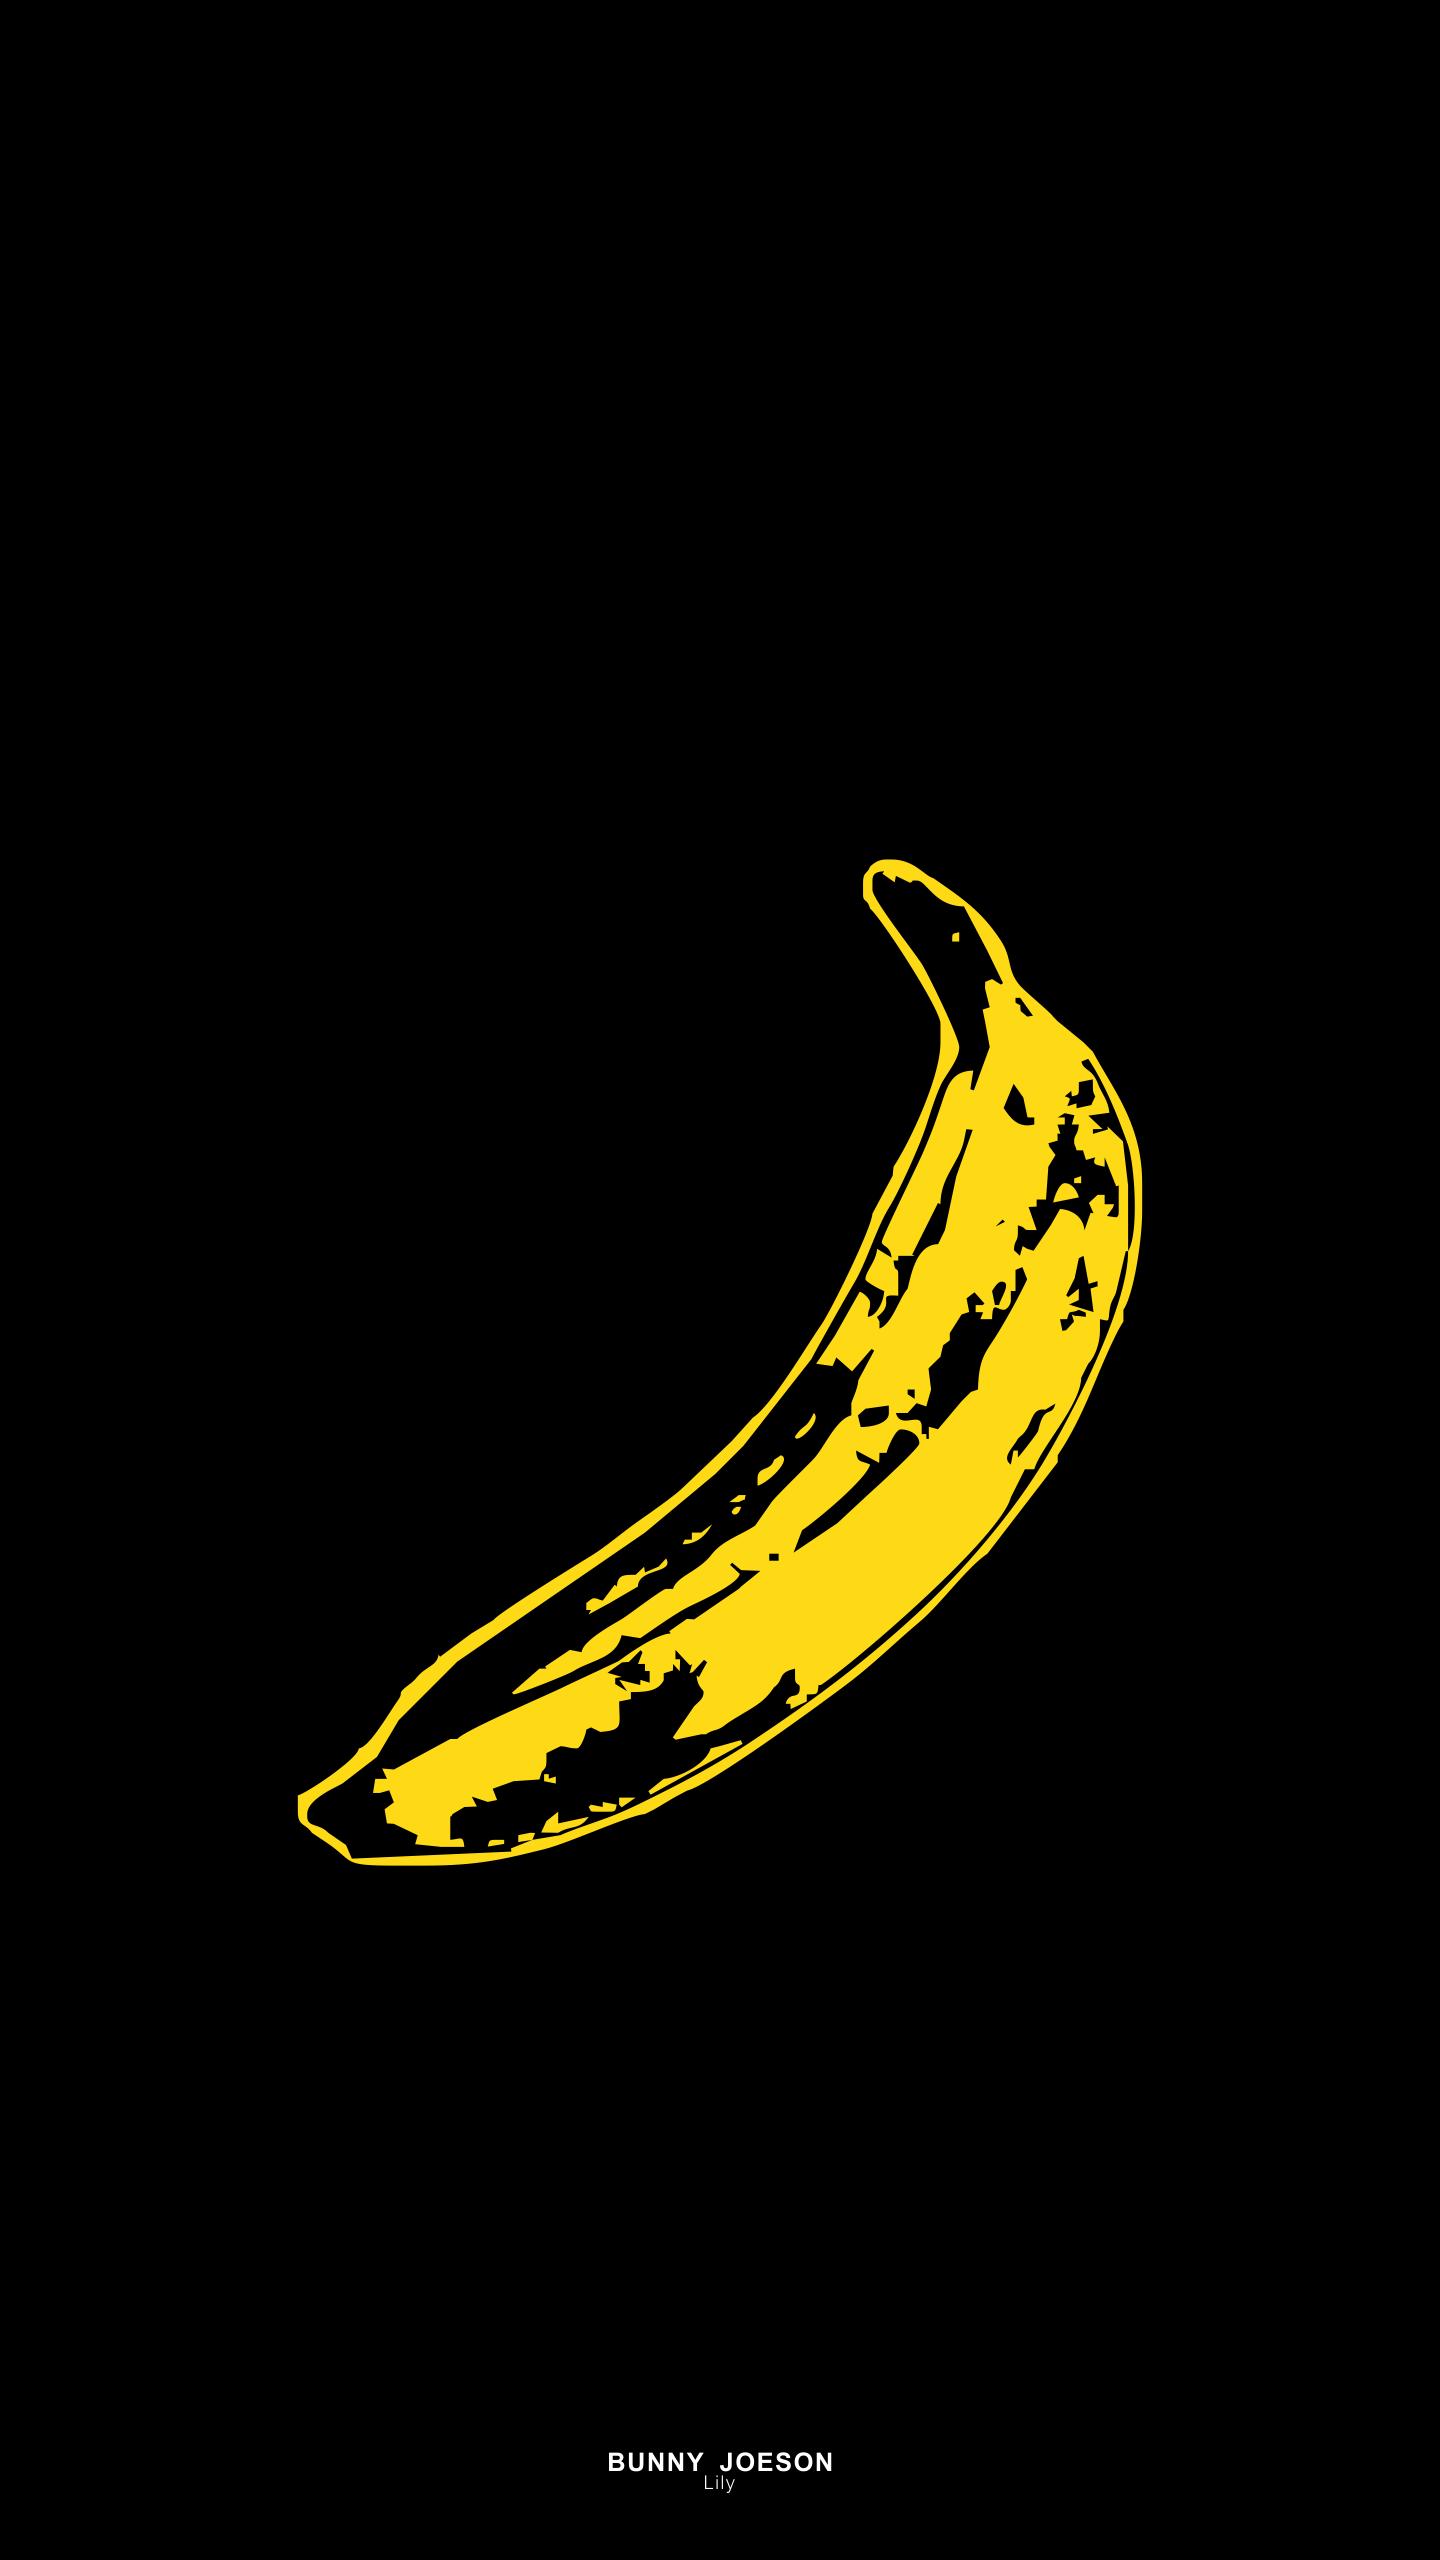 Aesthetic Banana Wallpapers Wallpaper Cave